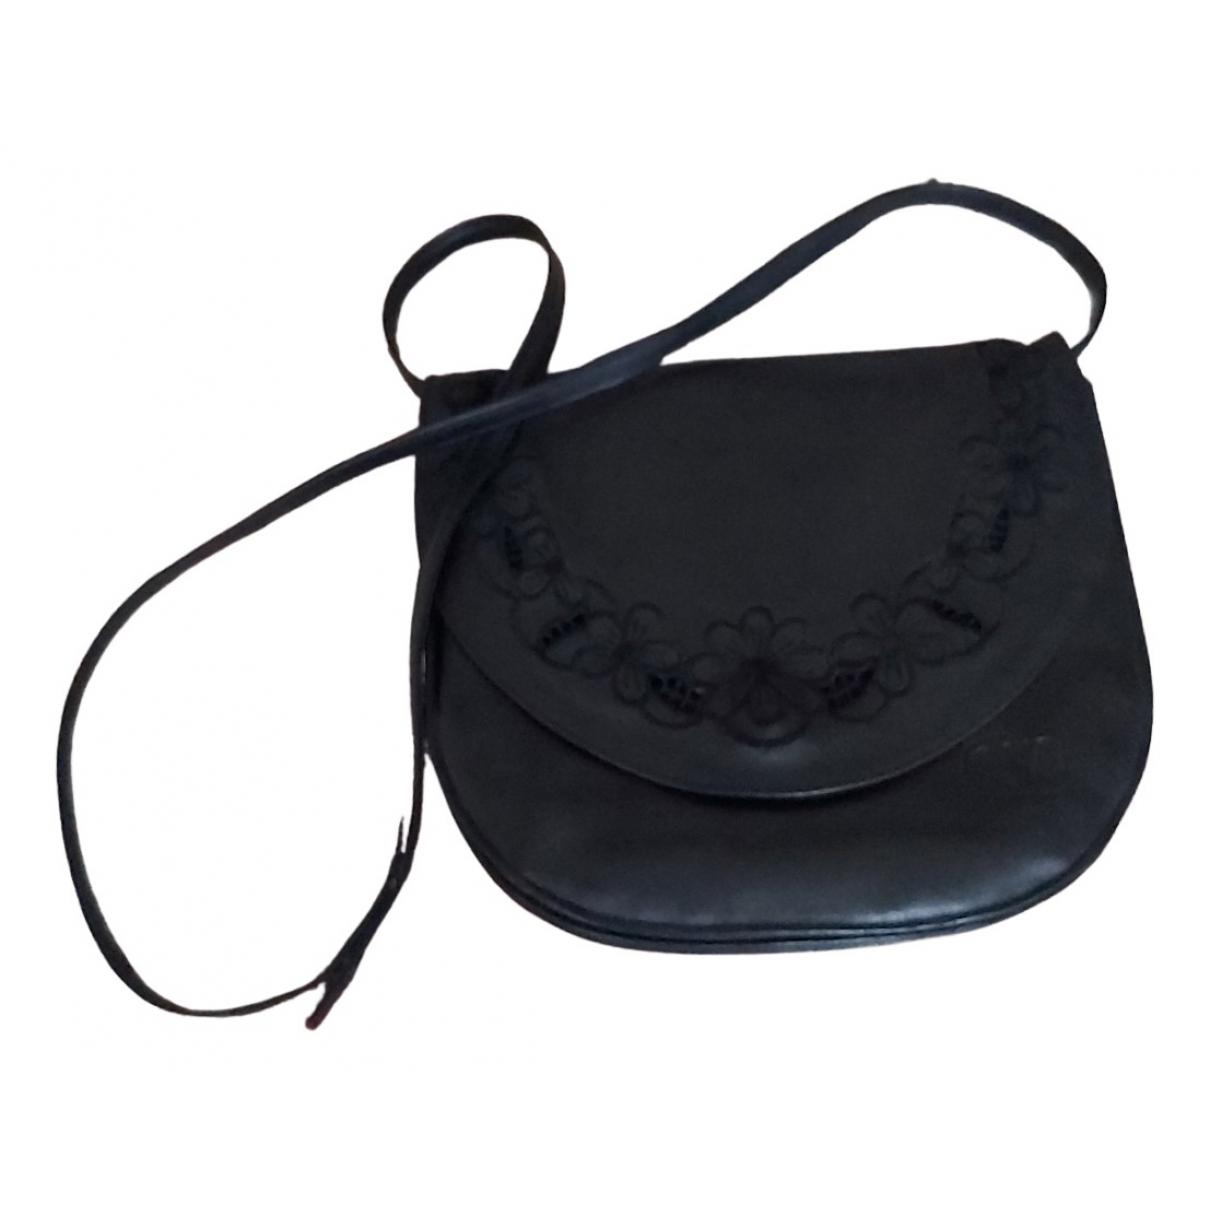 Valentino Garavani N Black Leather handbag for Women N